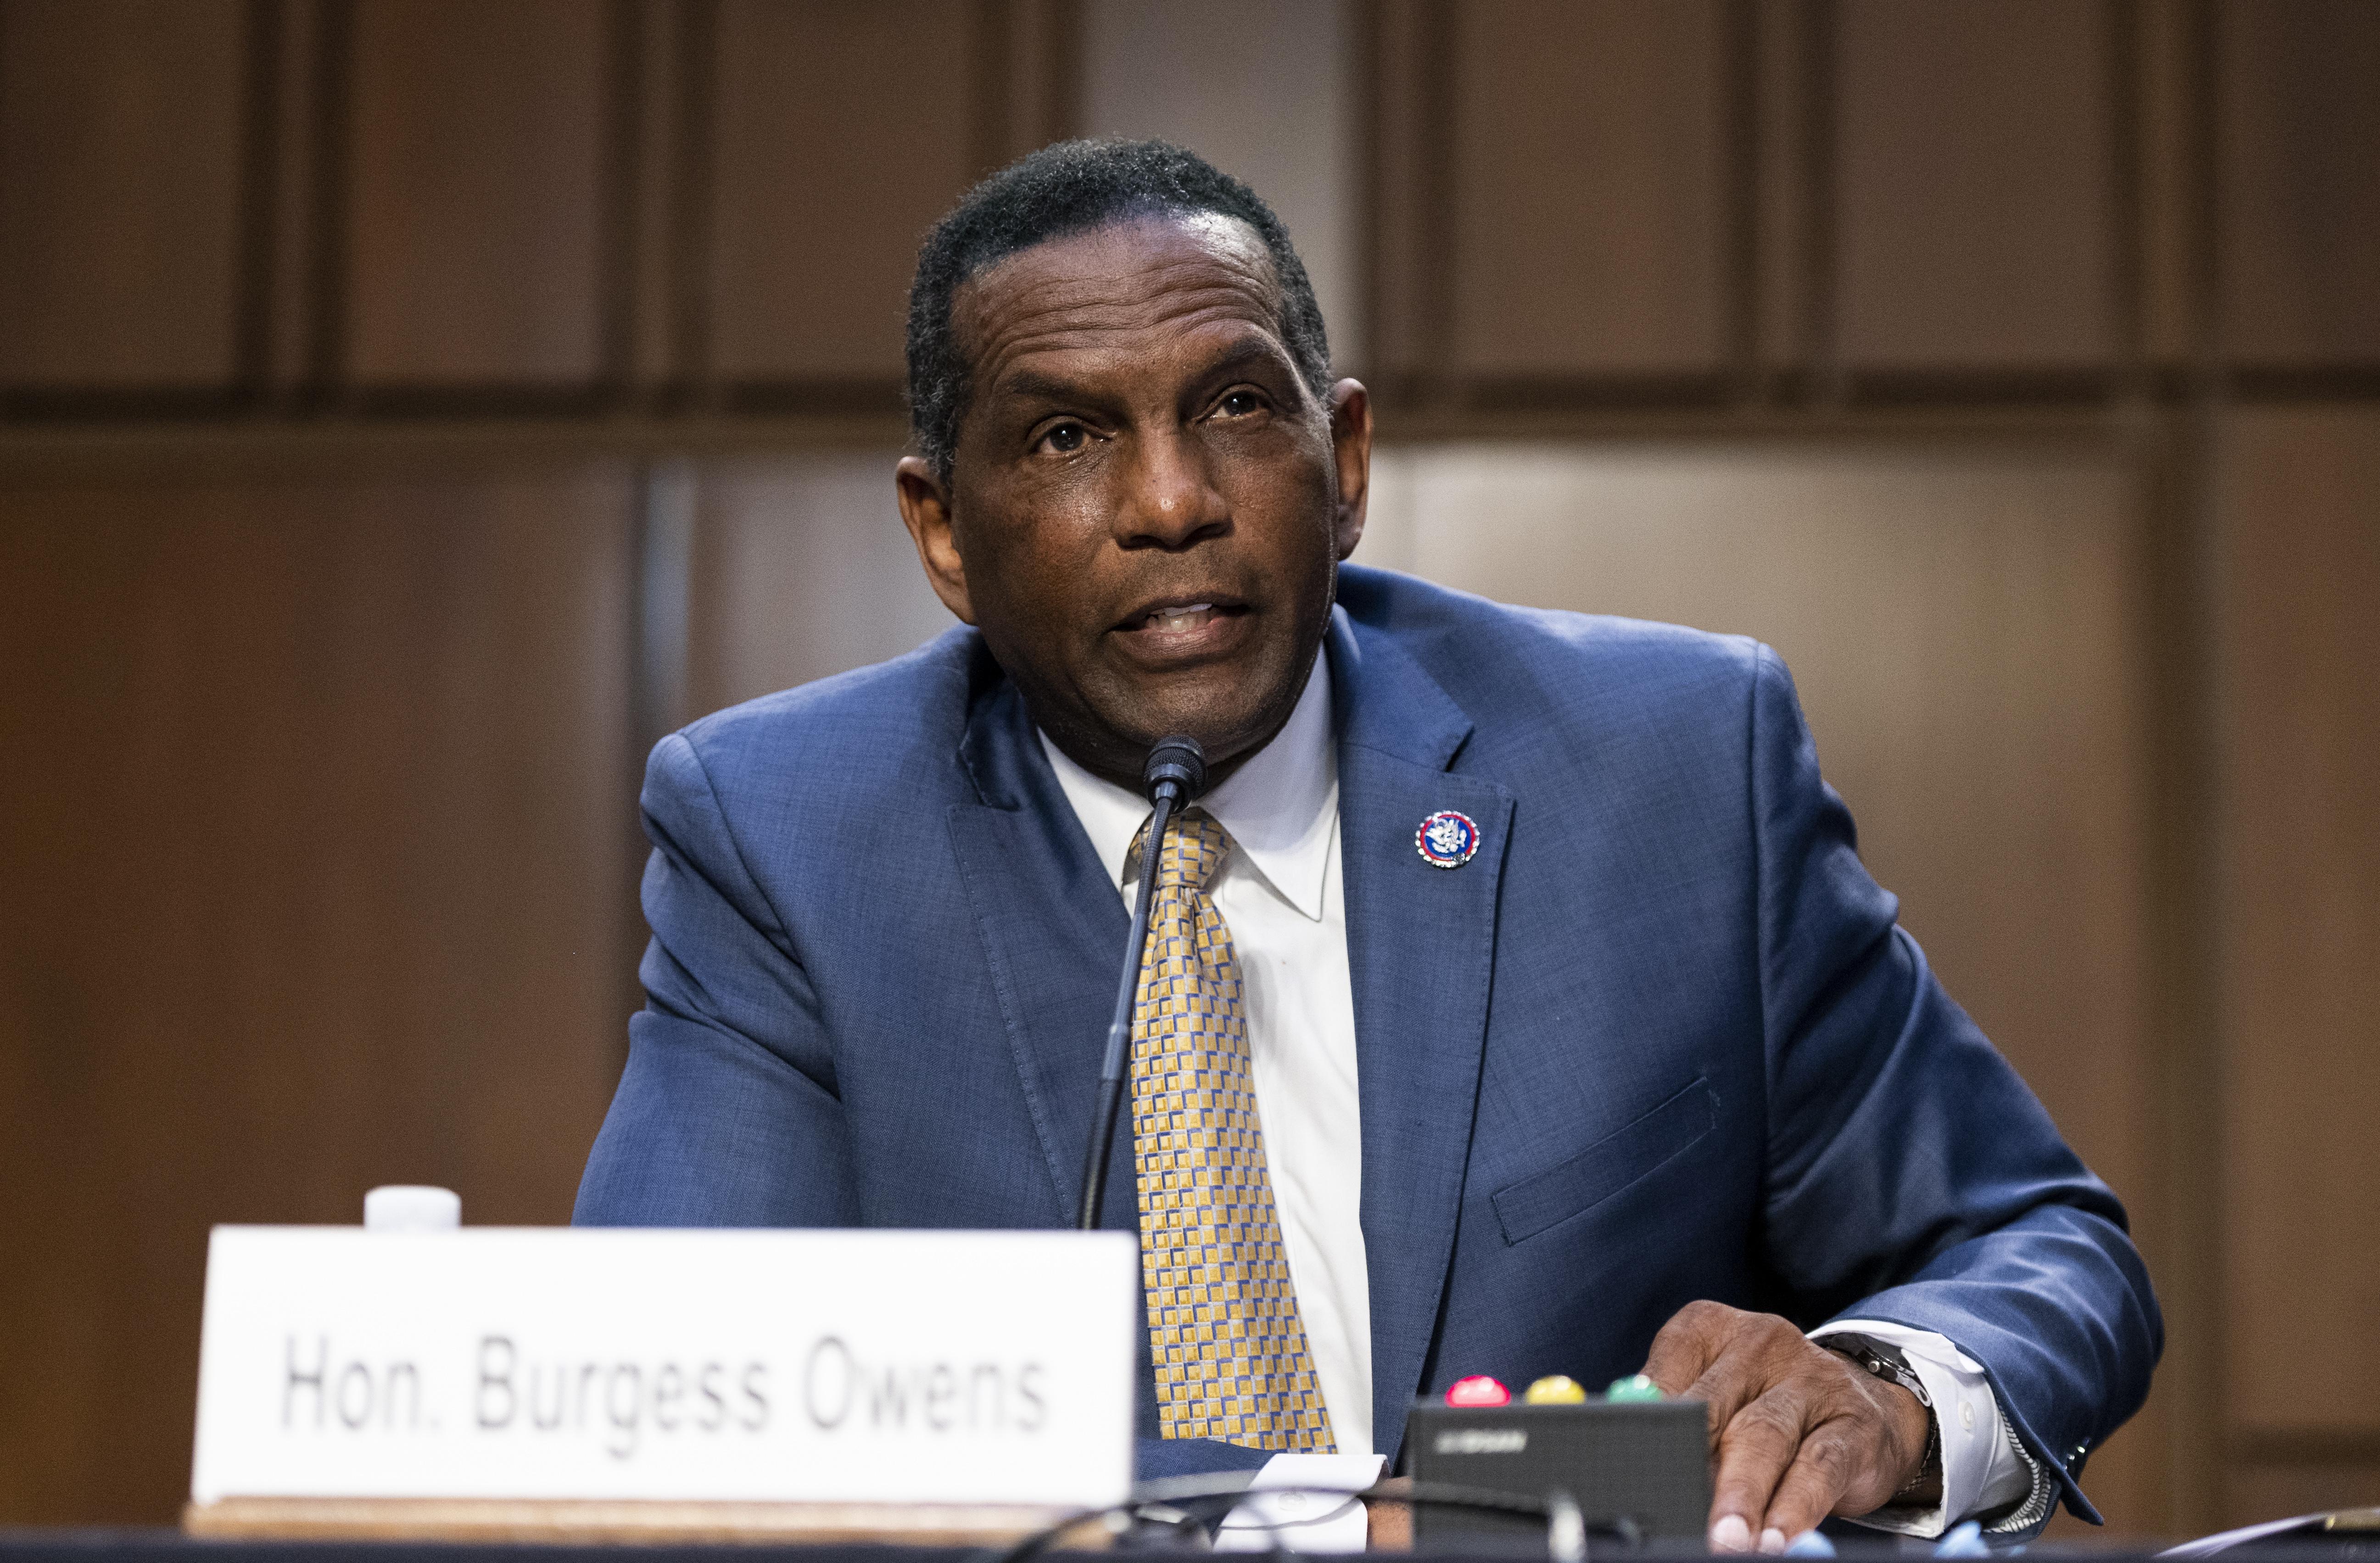 Rep. Burgess Owens, R-Utah, speaks during a Senate Judiciary Committee hearing on Capitol Hill.